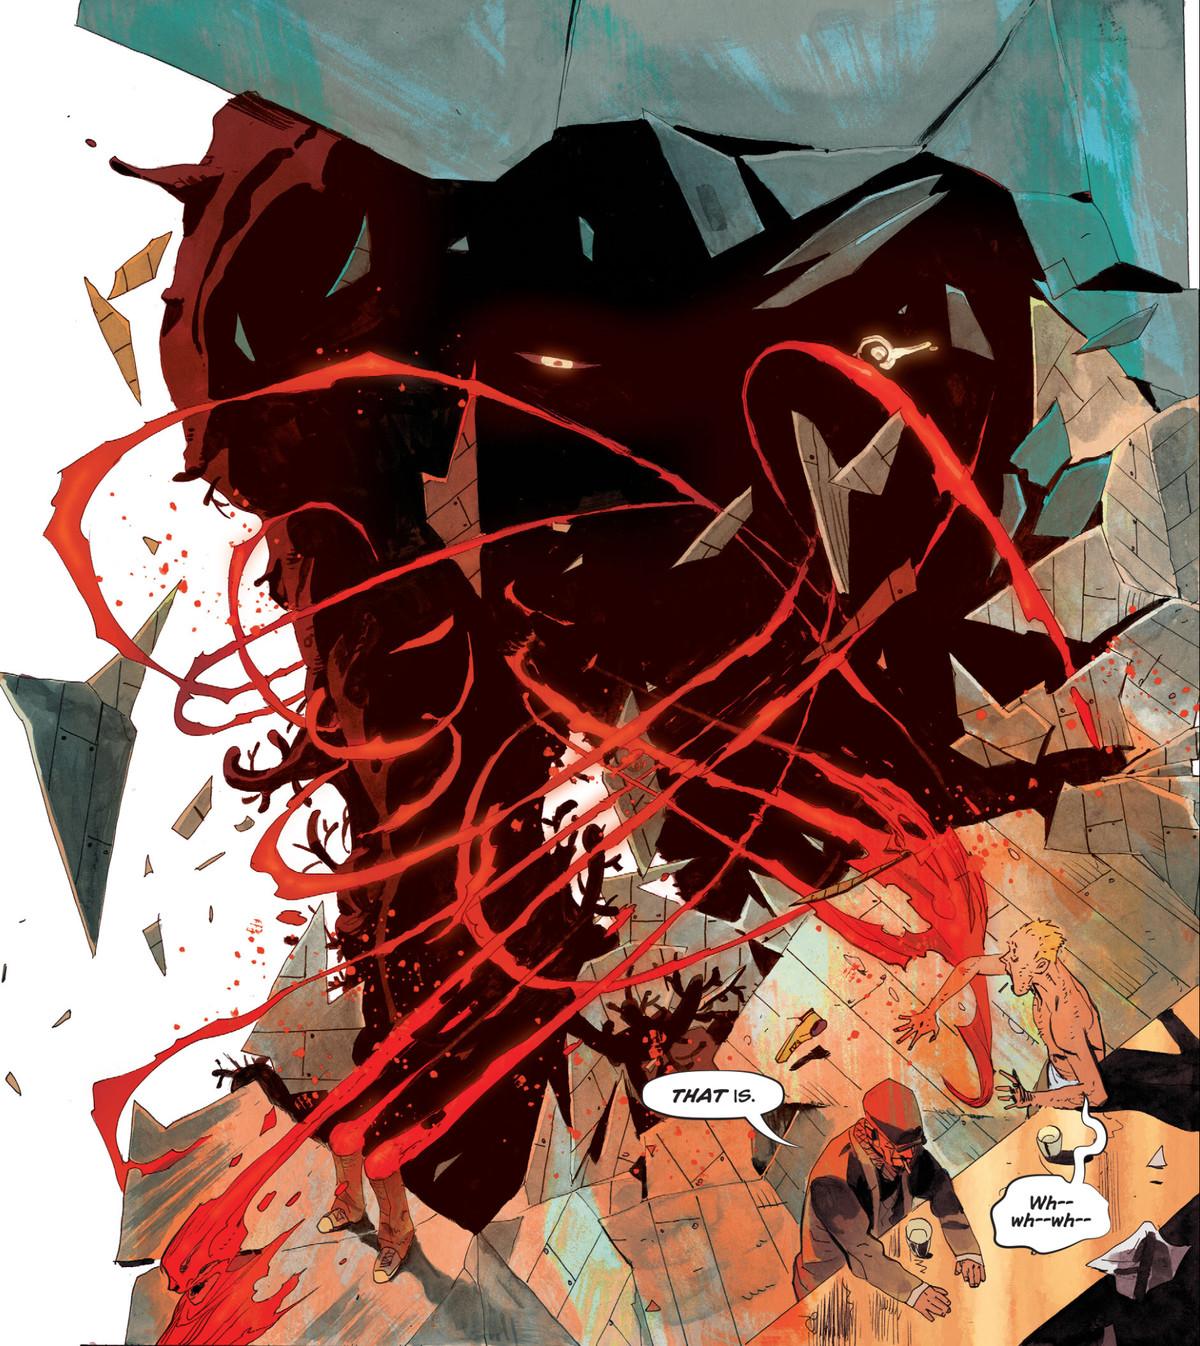 A huge monster, shapeless, dark, and staring, breaks through the walls of John Constantine's dream in John Constantine: Hellblazer #10, DC Comics (2020).